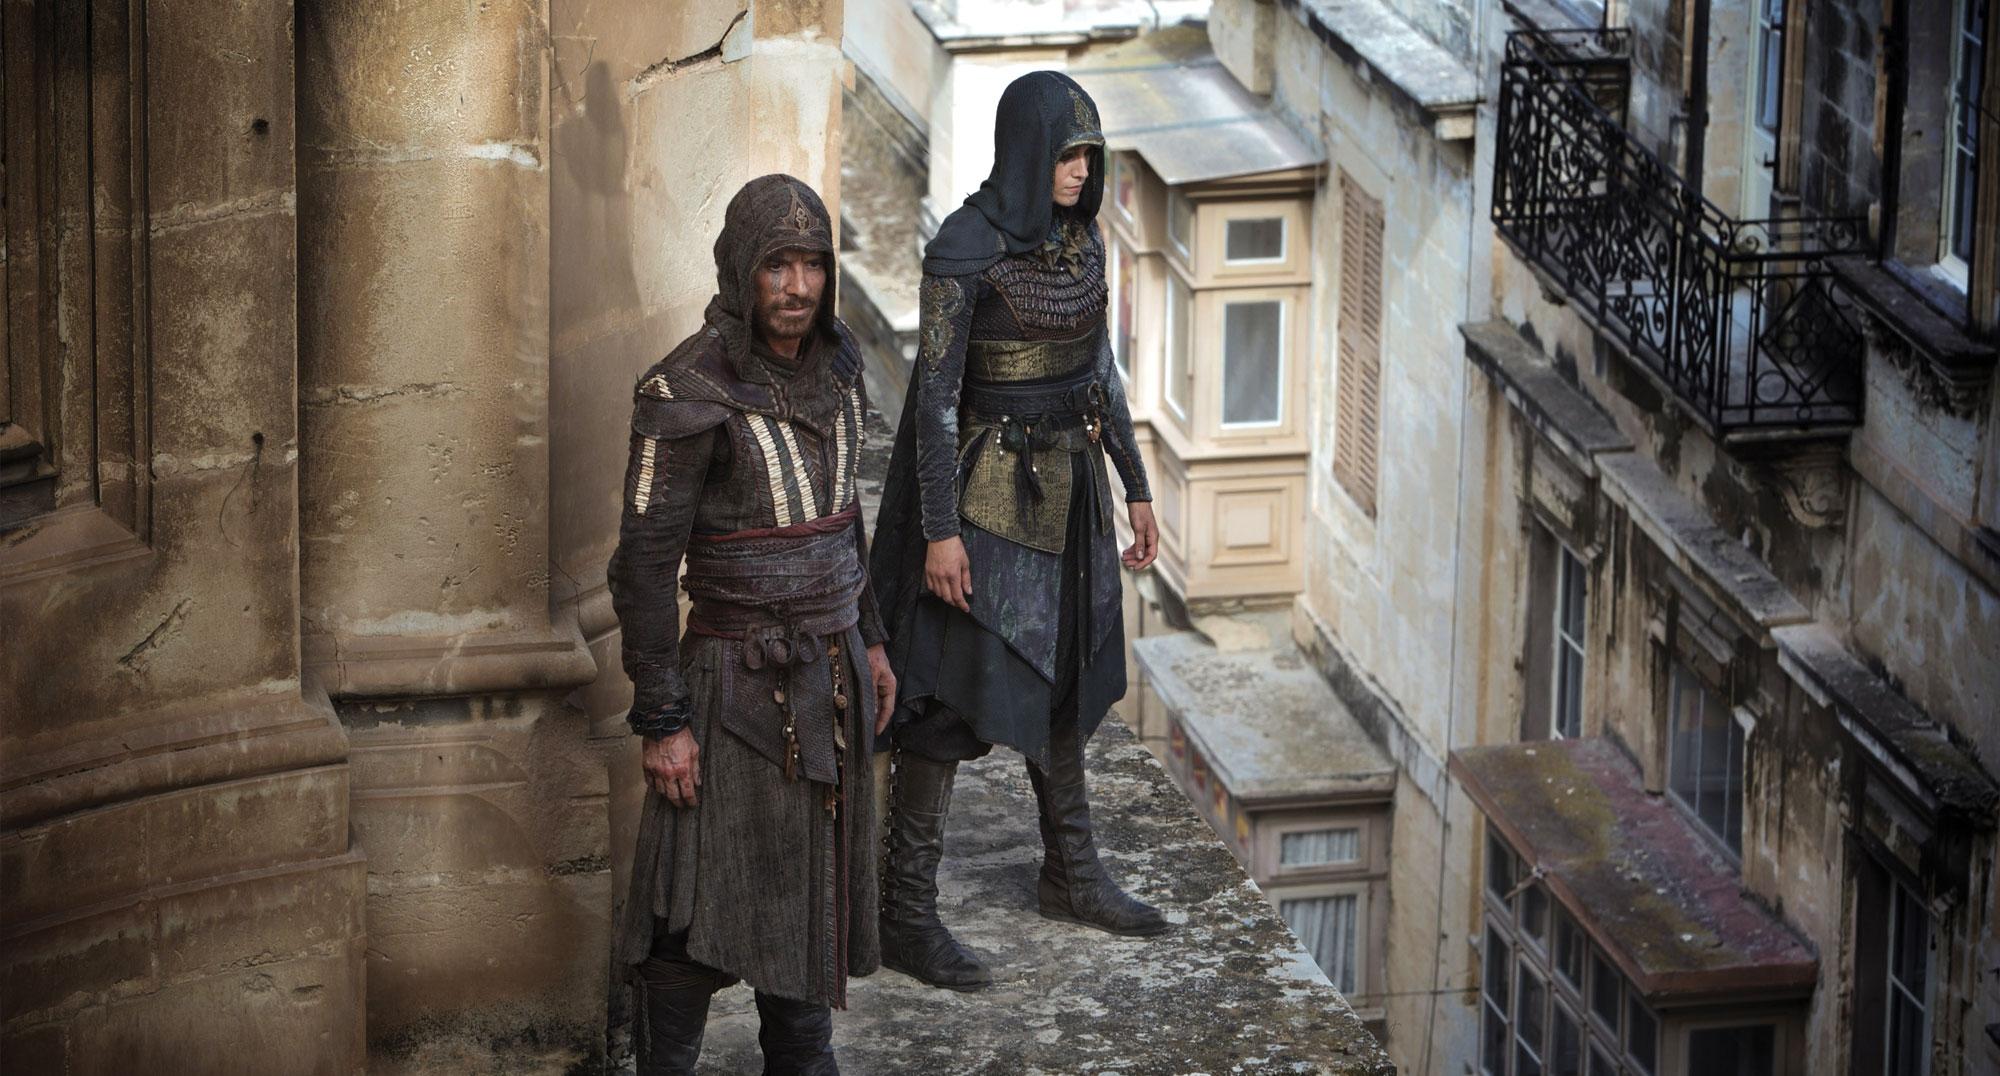 assassins-creed-gallery-04-gallery-image.jpg